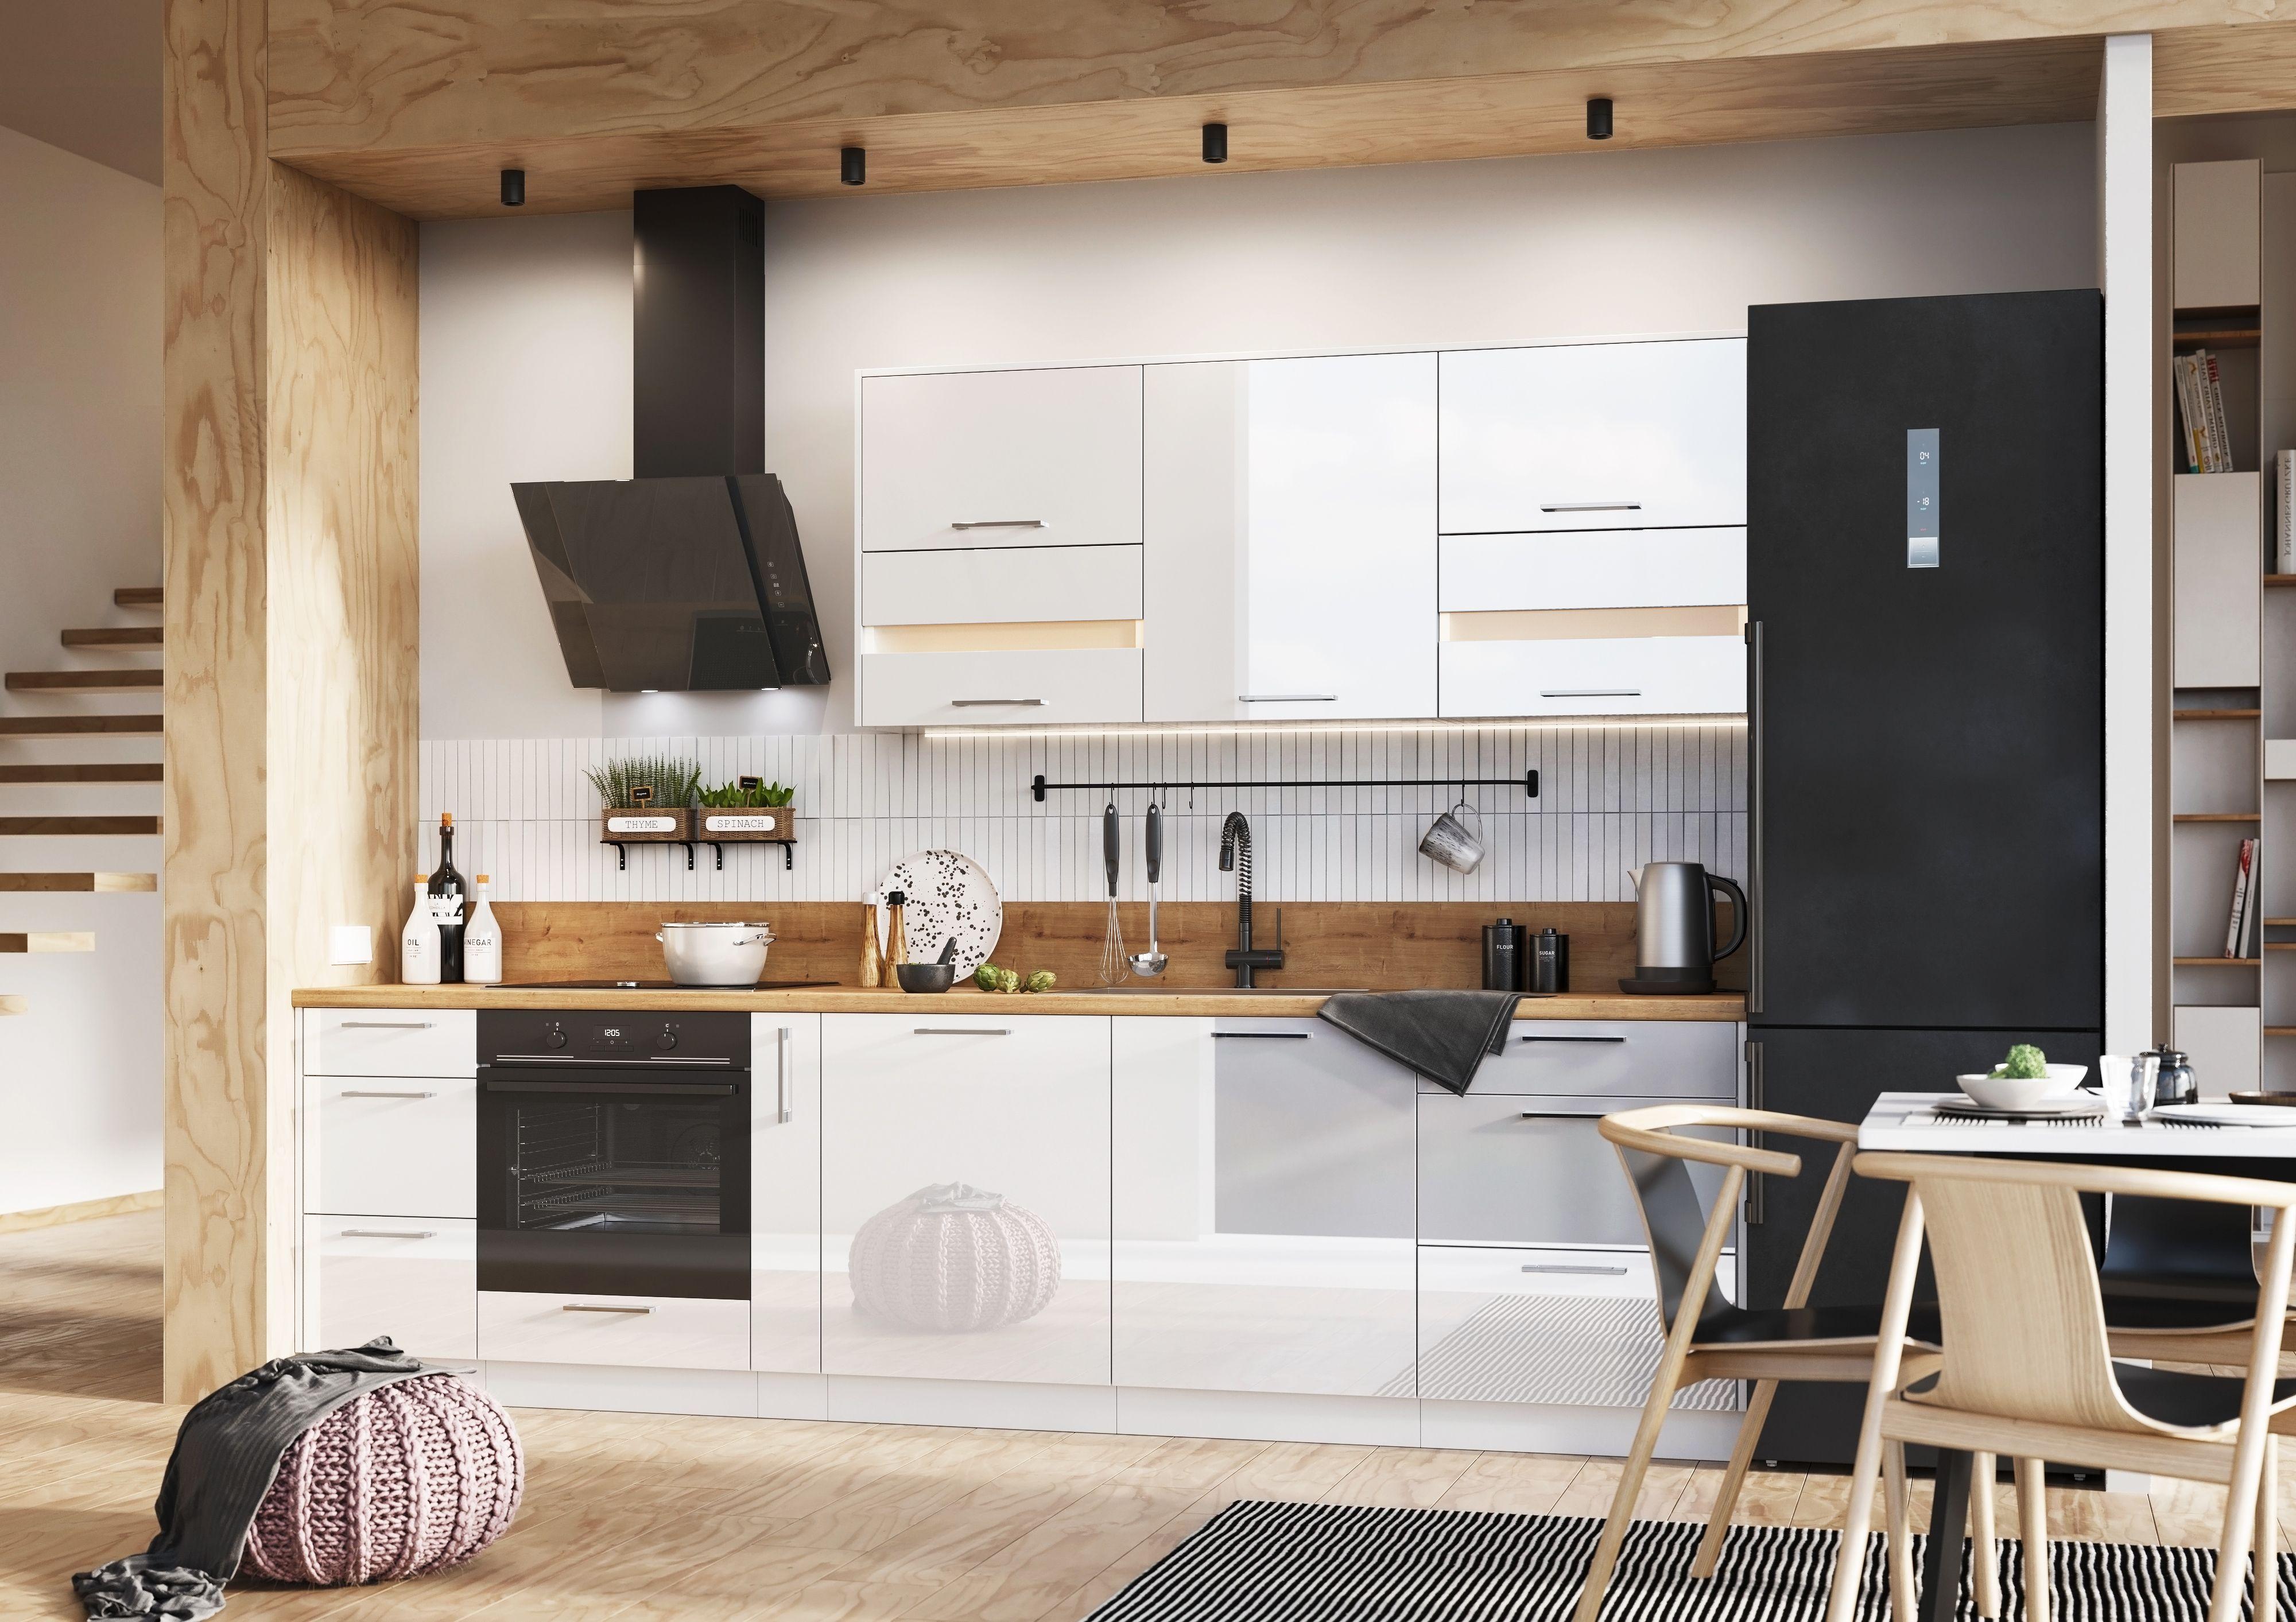 Meble Kuchenne Oskar Kuchnia Pod Wymiar Bialy Polysk Kitchen Cabinets Kitchen Furniture